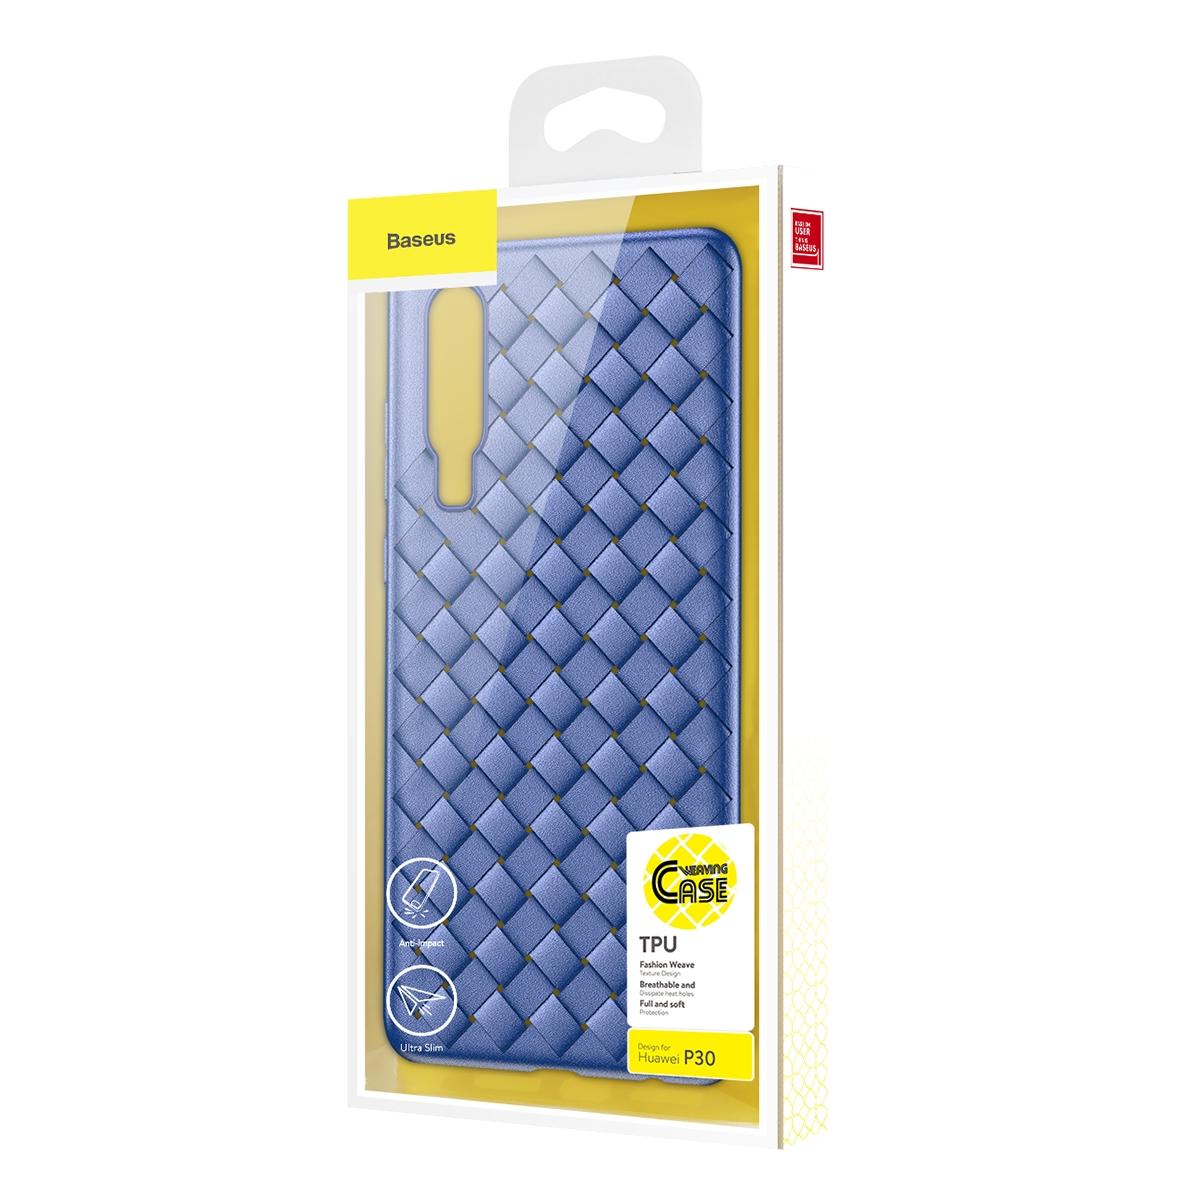 Huawei P30 Baseus BV Weaving Case WIHWP30-BV03 Blue